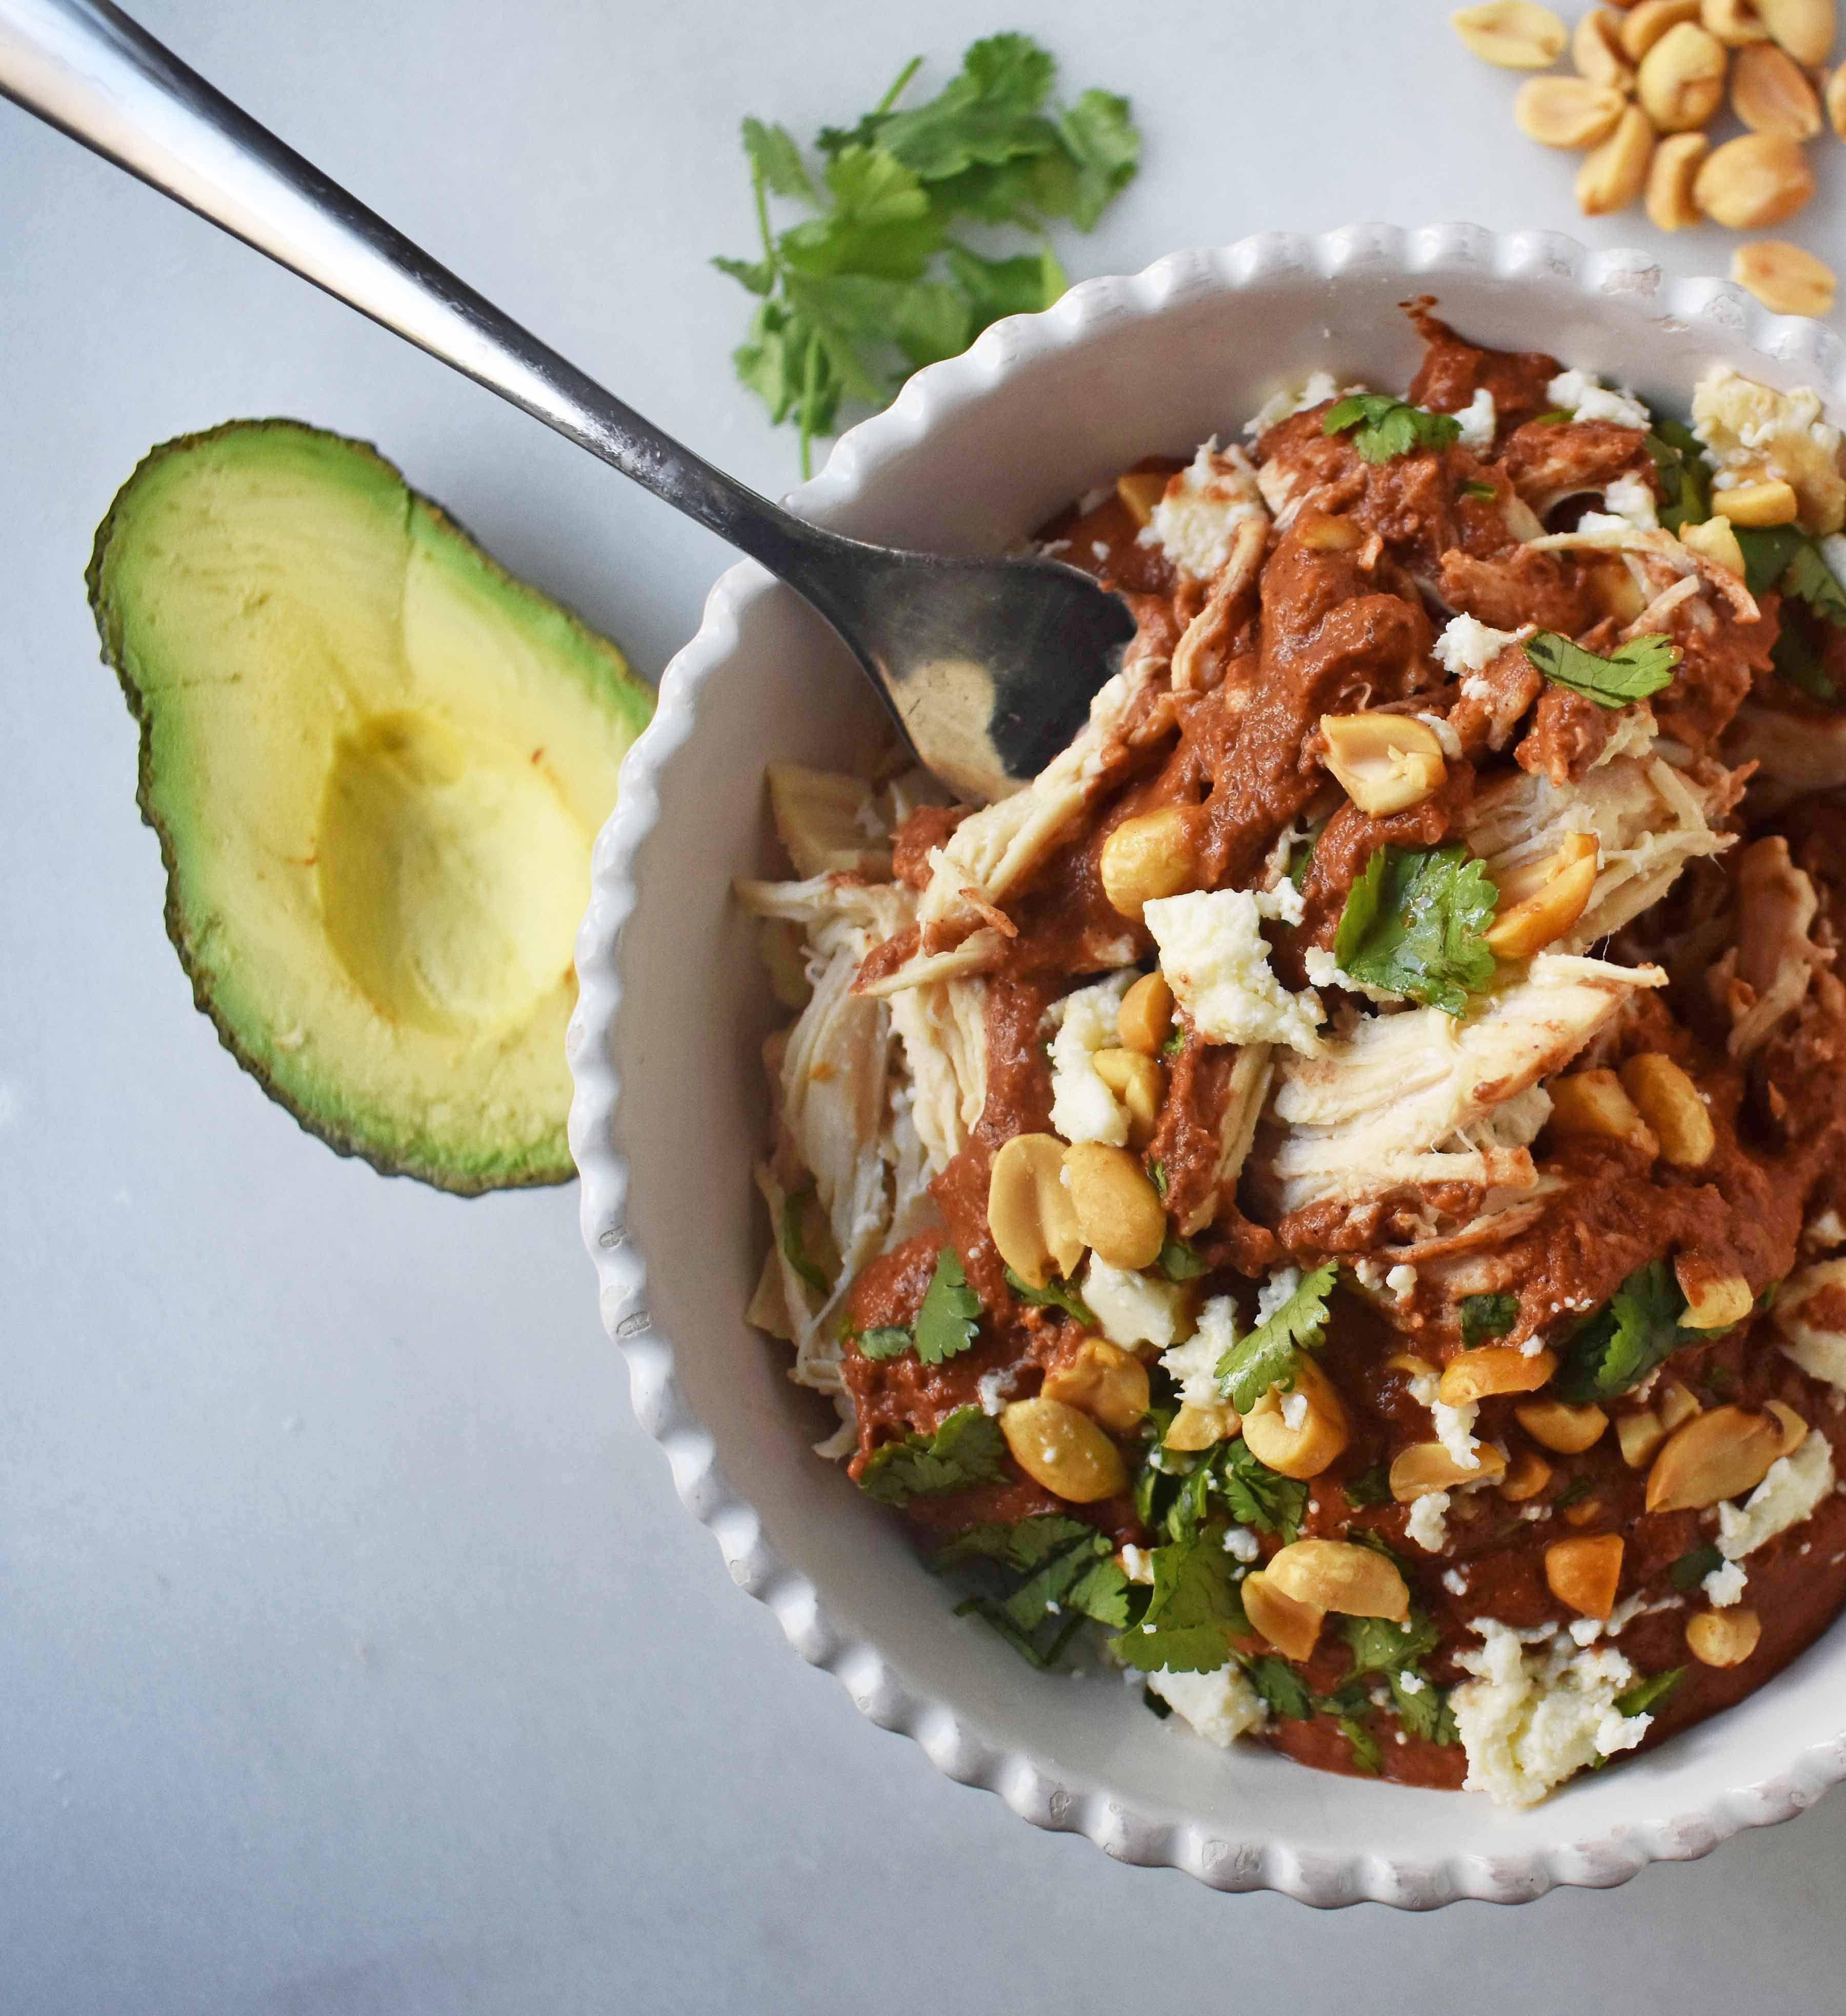 Best Chicken Mole Recipes: Crockpot Mexican Chicken Mole. Rich Mole Made Easy In A